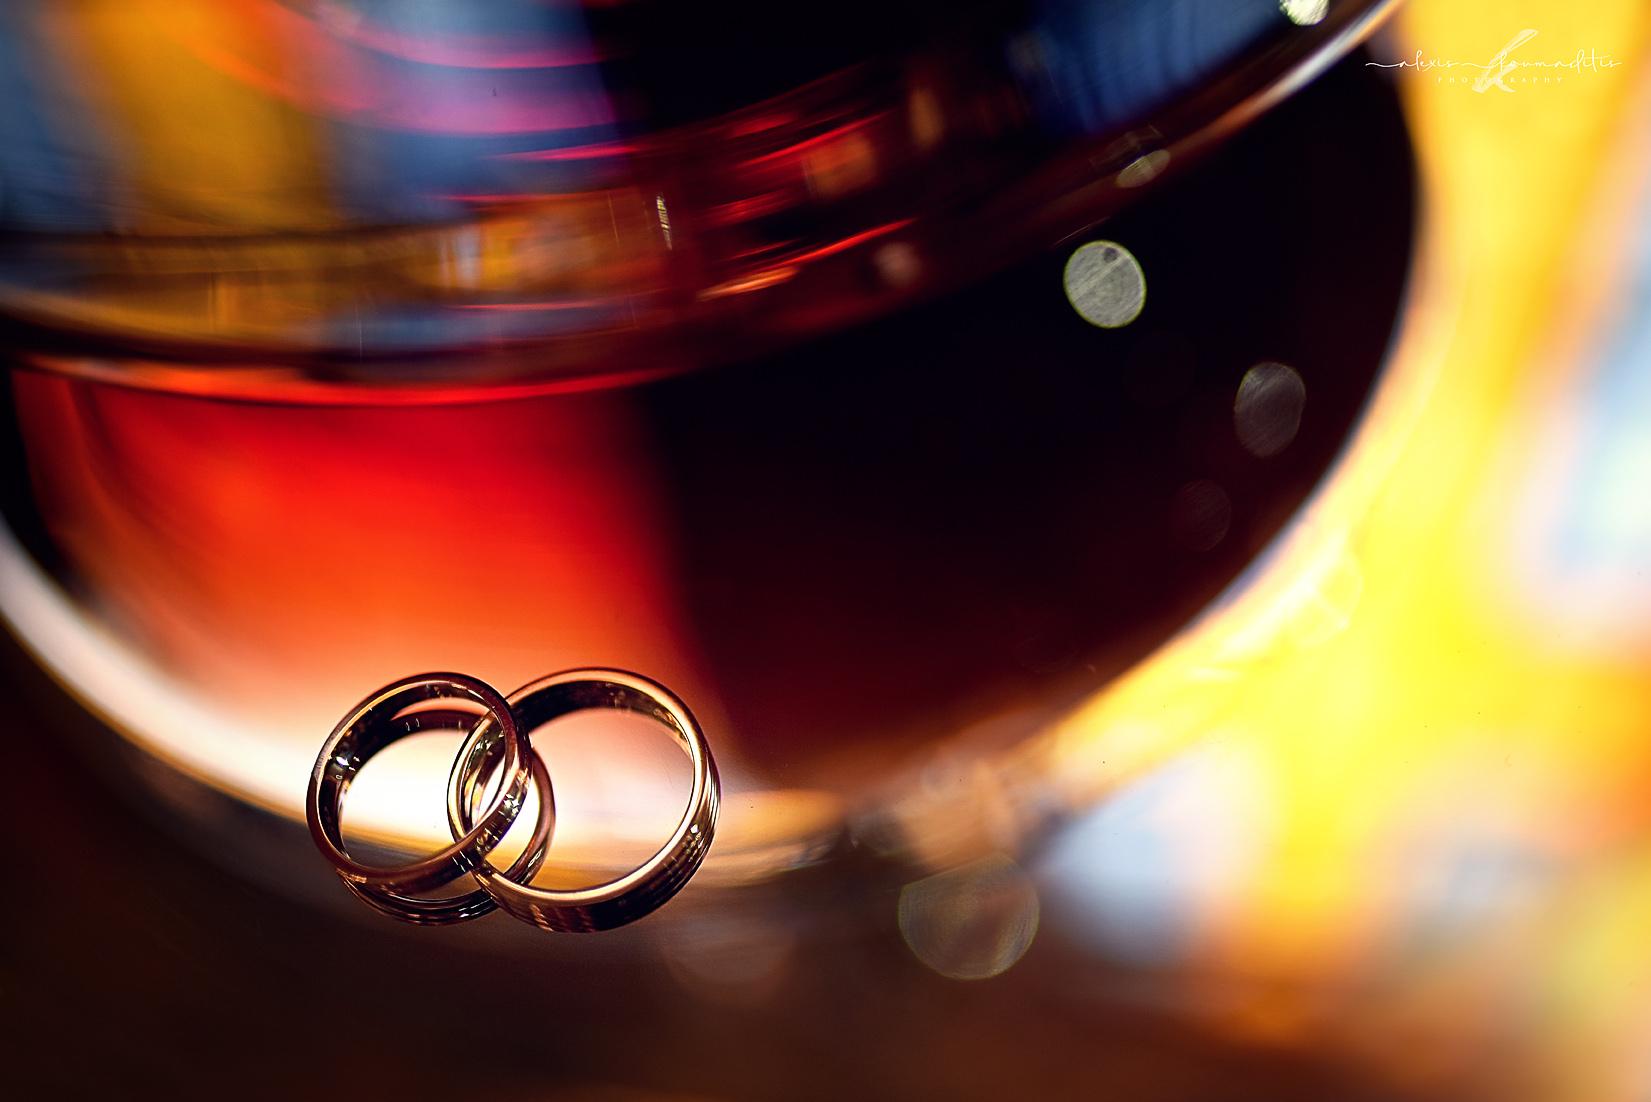 wedding- photography- wedding-rings -θεσσαλια-λαρισα-φωτογραφια-γαμου-alexis-koumaditis